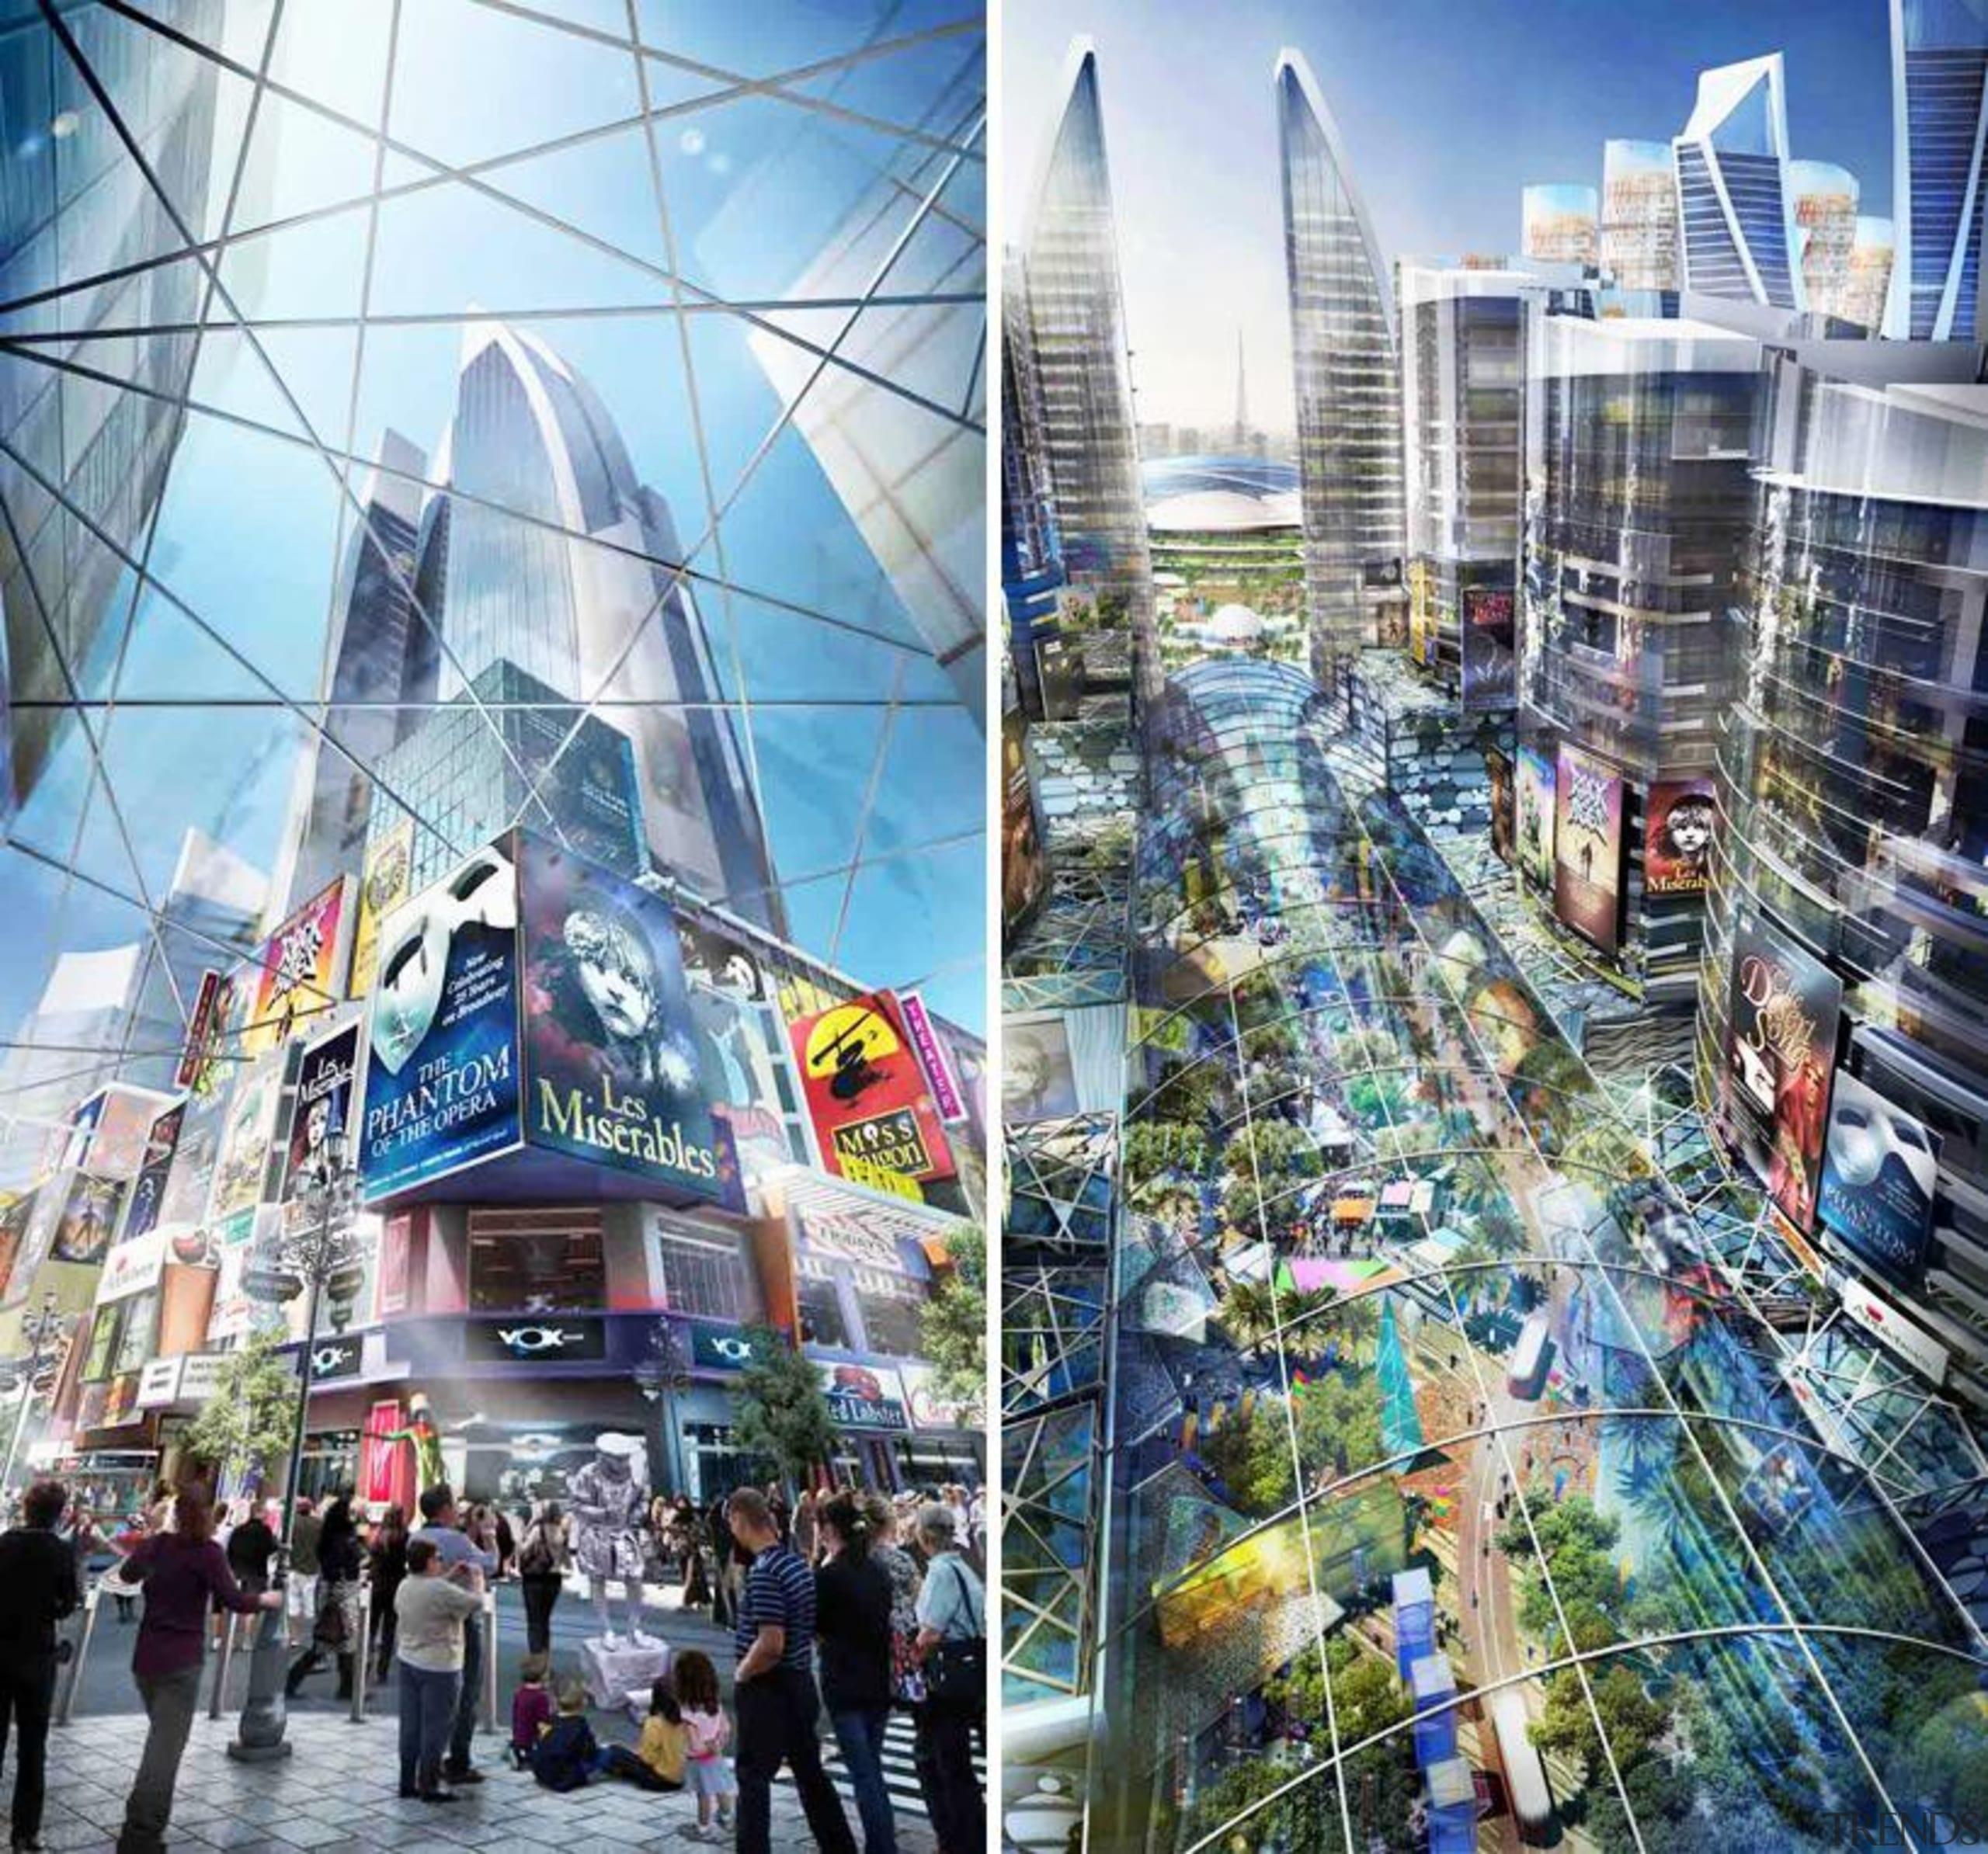 Although titled 'Mall of The World' this 48 building, city, cityscape, landmark, metropolis, metropolitan area, mixed use, skyscraper, tourist attraction, urban area, gray, white